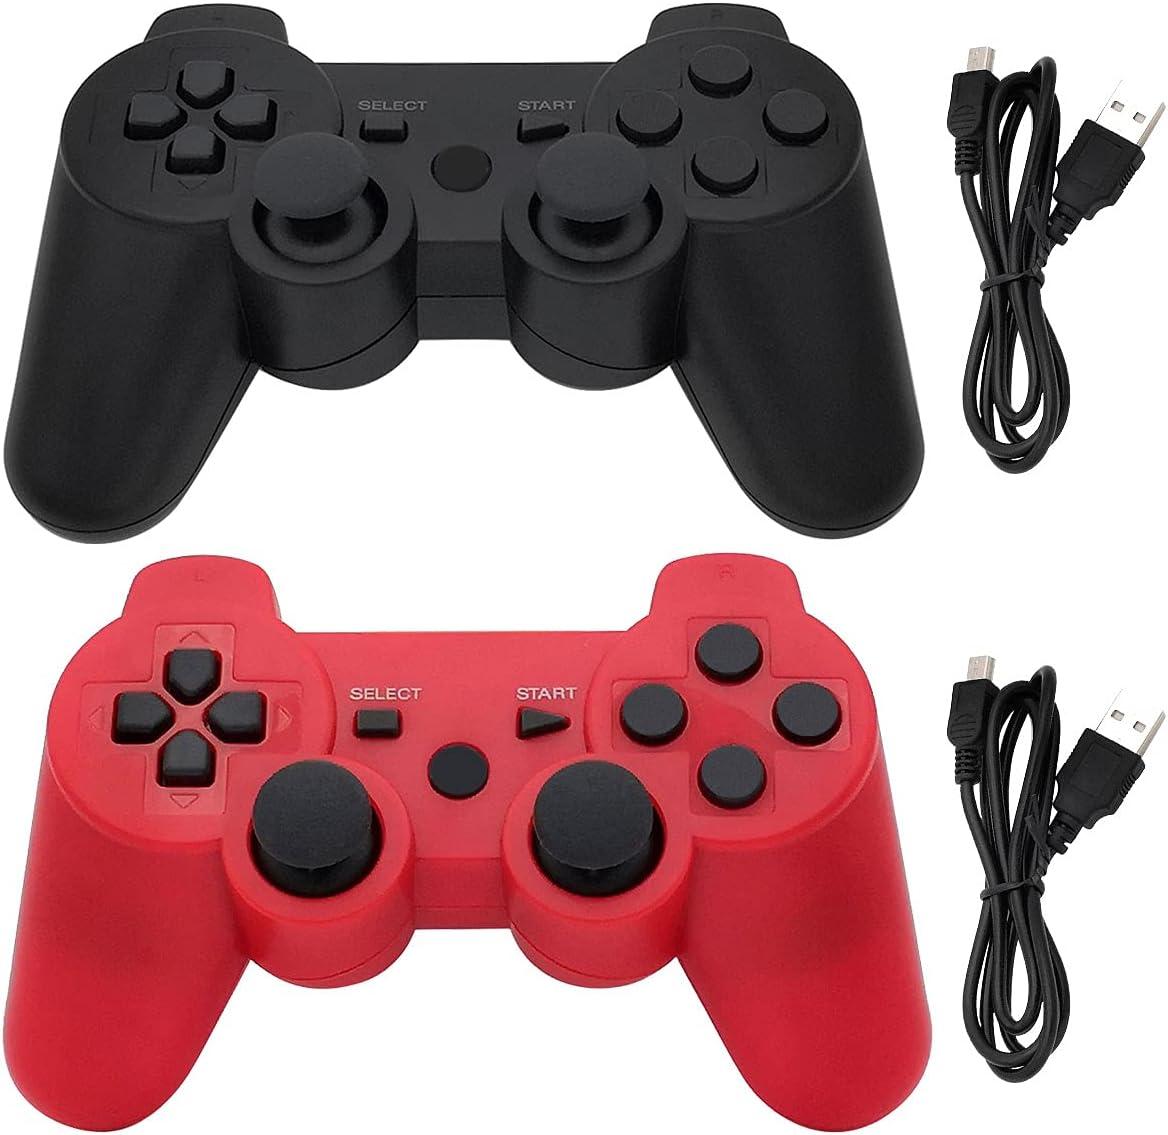 Ceozon New sales PS3 Controller Wireless Playstation 3 Seasonal Wrap Introduction Bluetoot